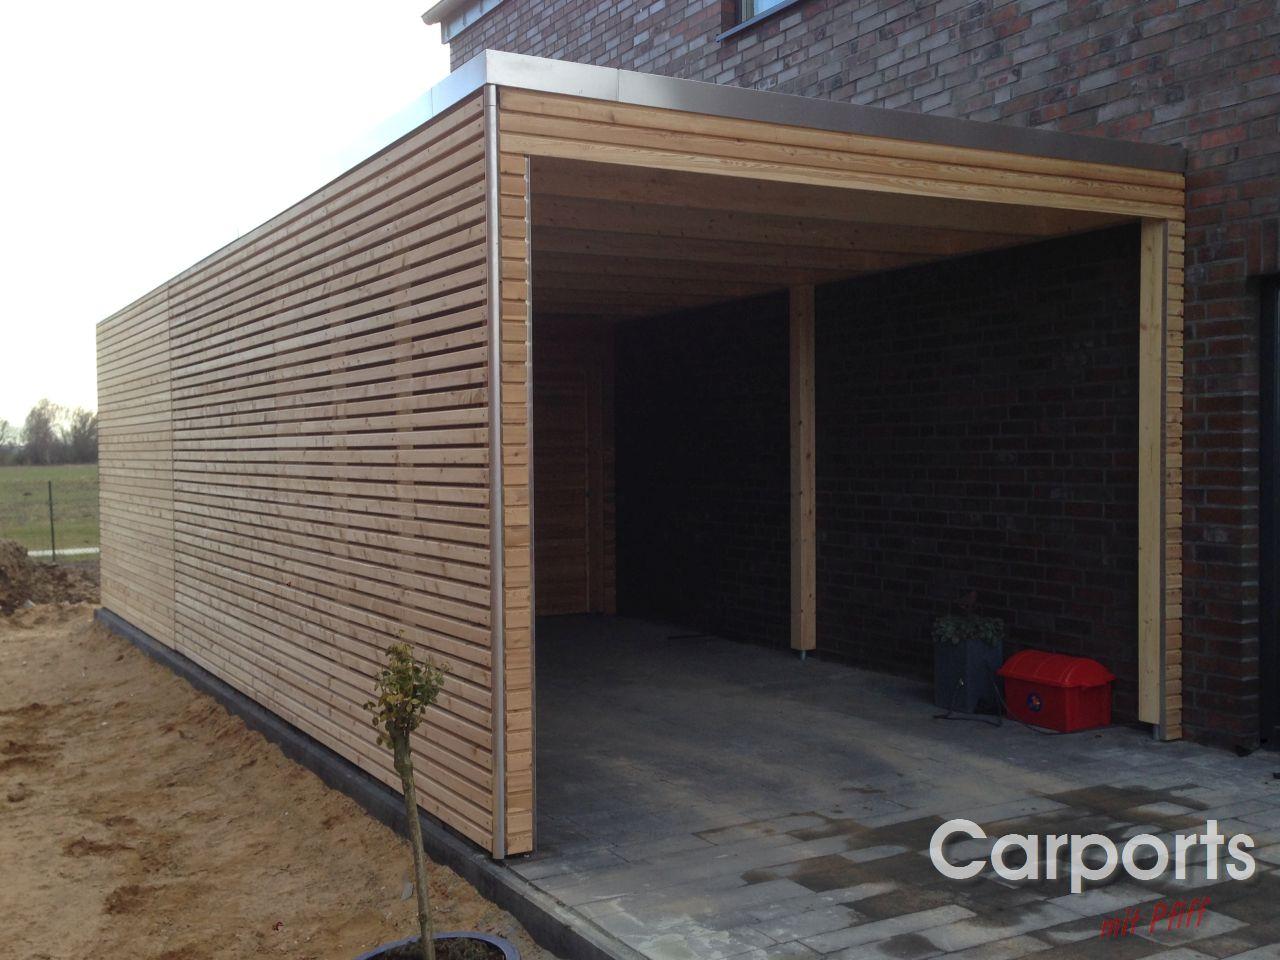 Carport En Garage : Carport bauhaus rhombo aus sibirischer lärche carports mit pfiff